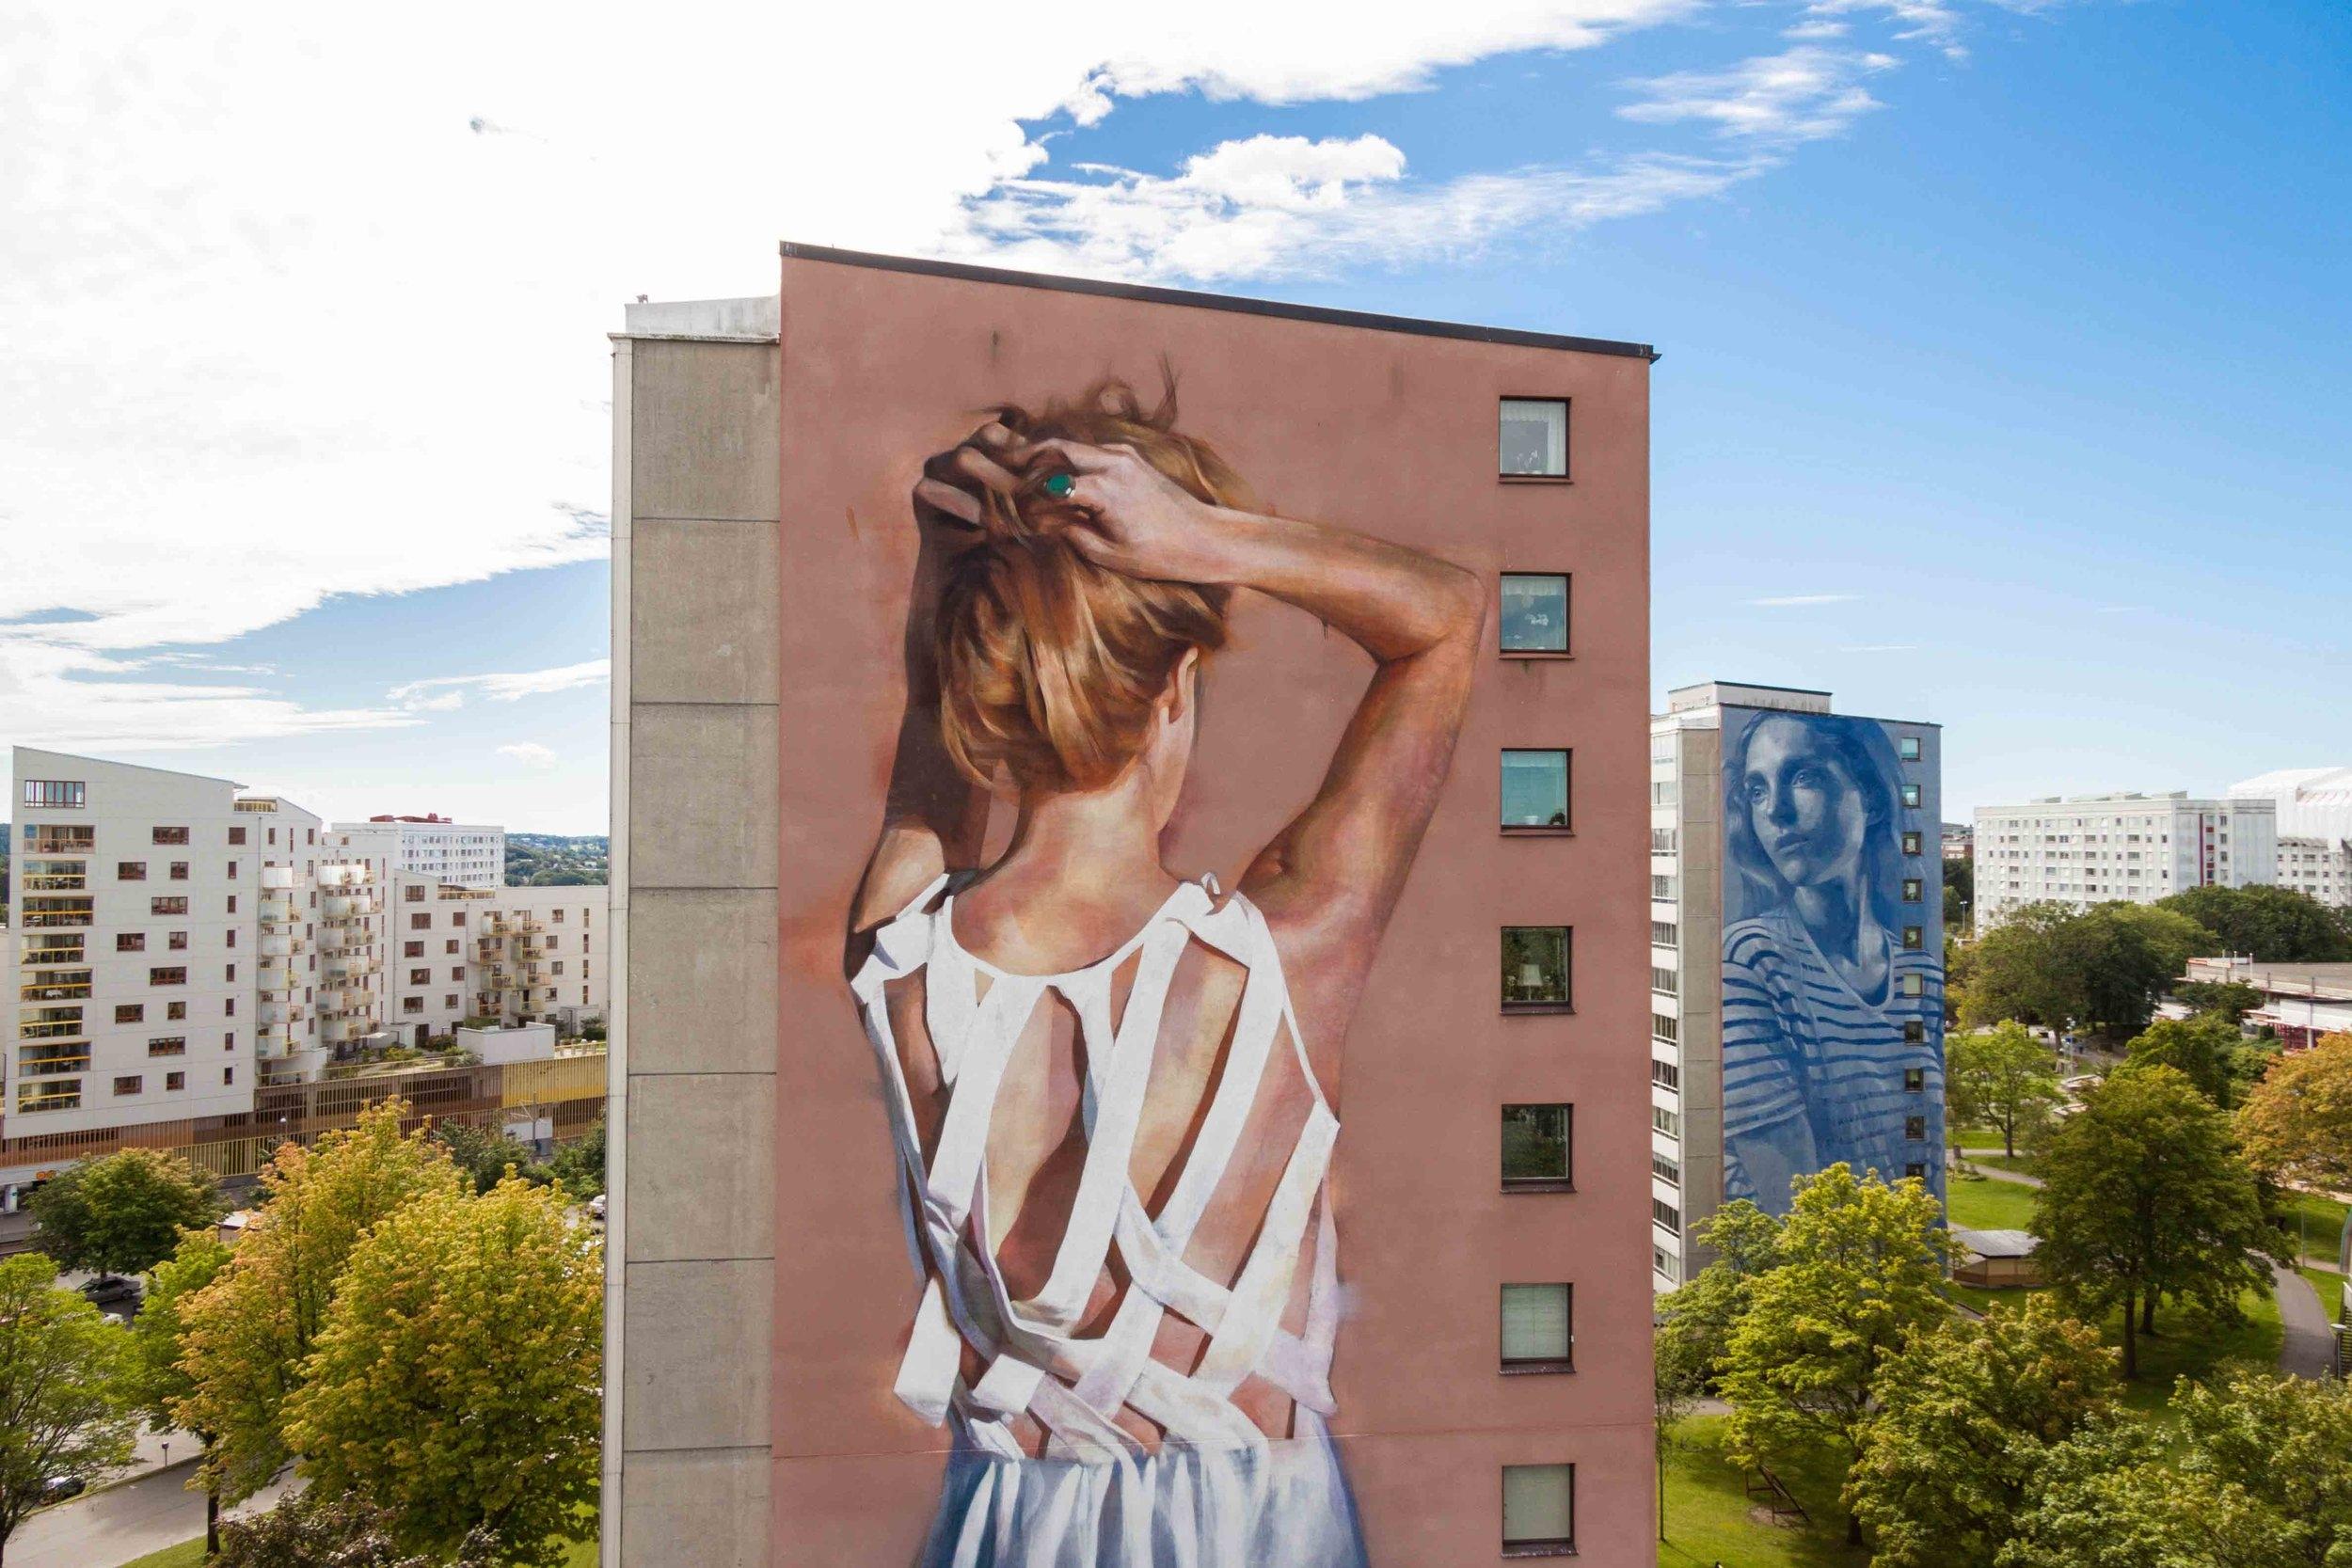 Image credit:  Artscape . Featured work by Australian artist, Rone.